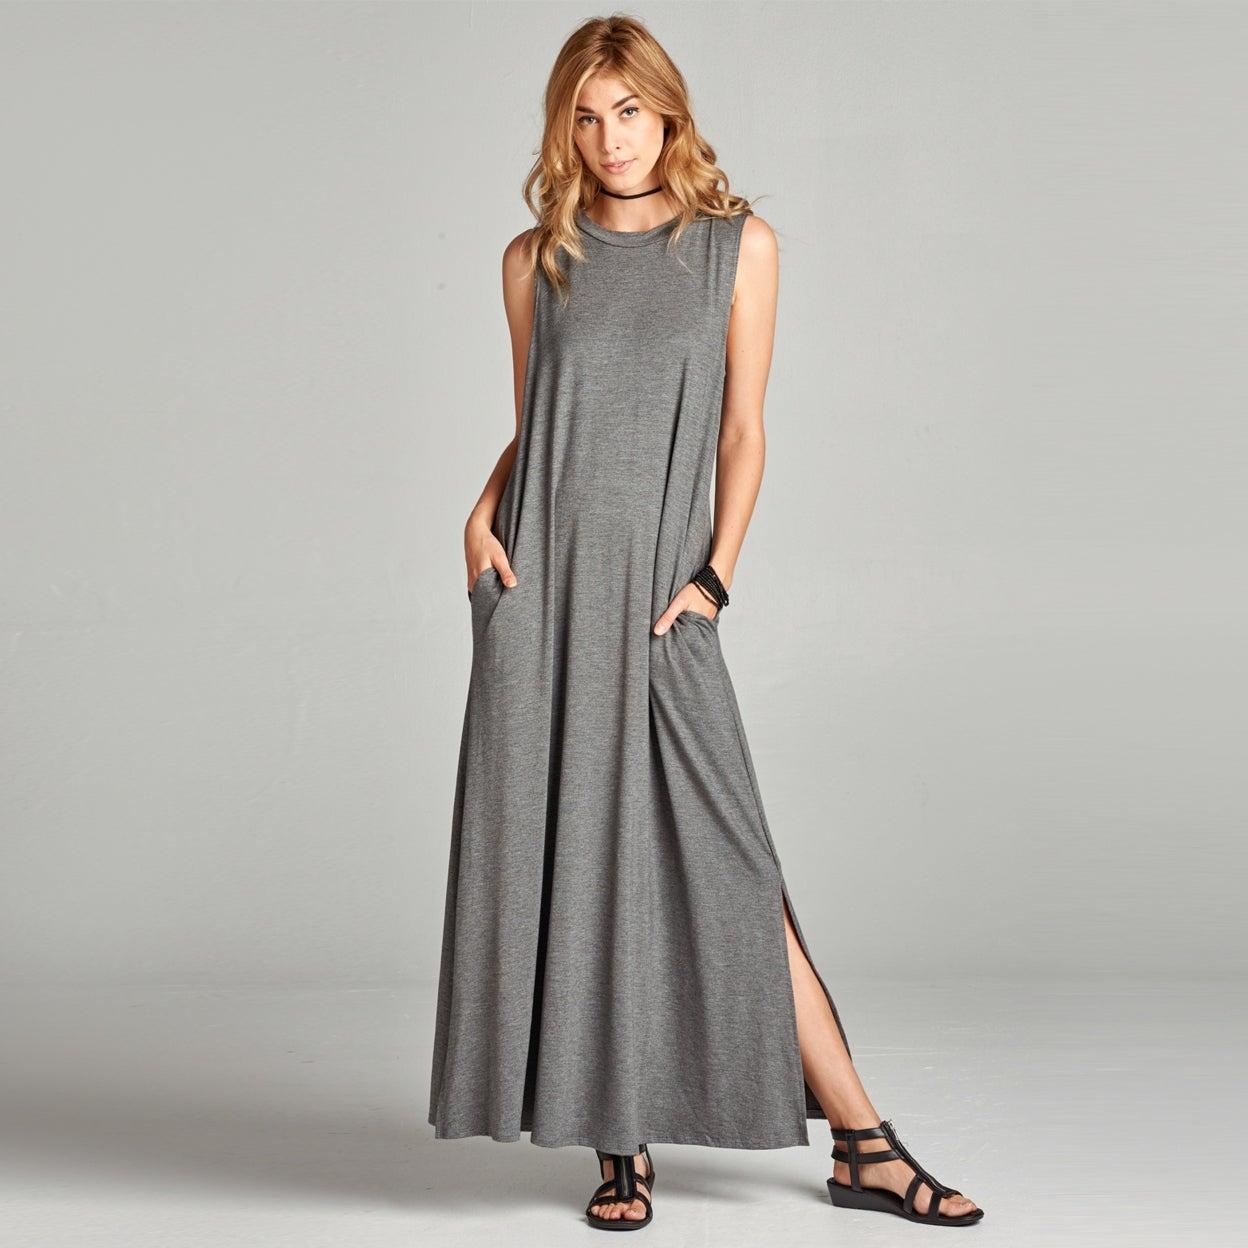 1981184b5 Maxi Dresses With Pockets